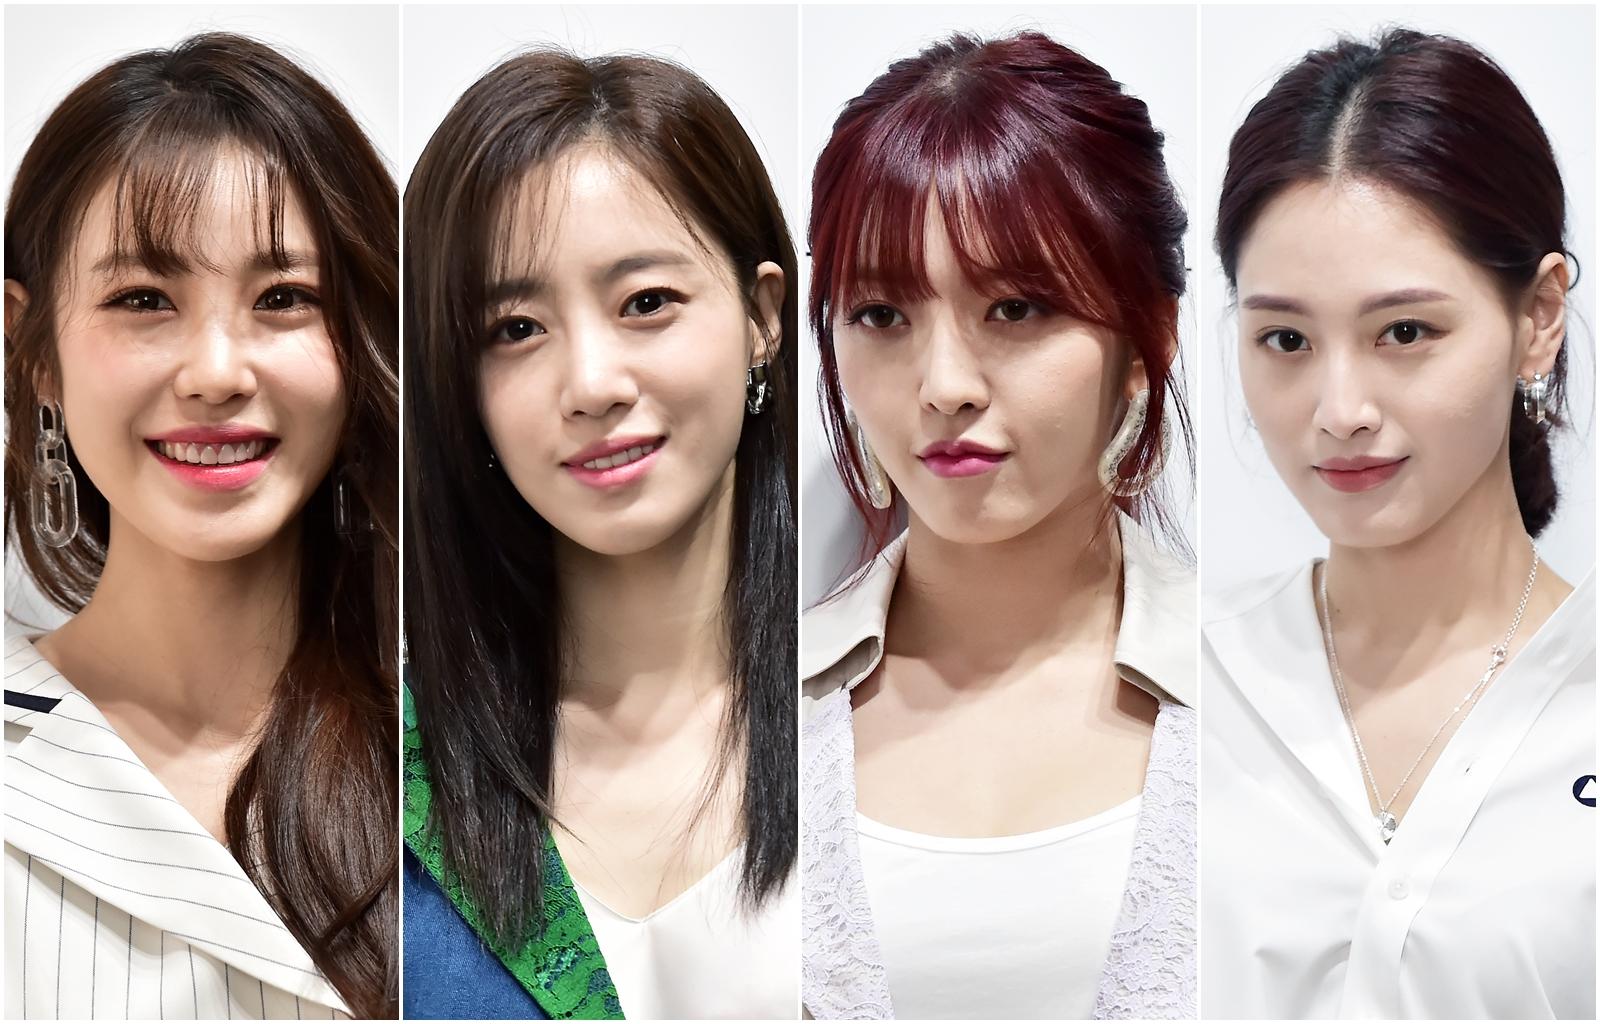 19FW 컬렉션 프레젠테이션 '서울의 색을 입다'